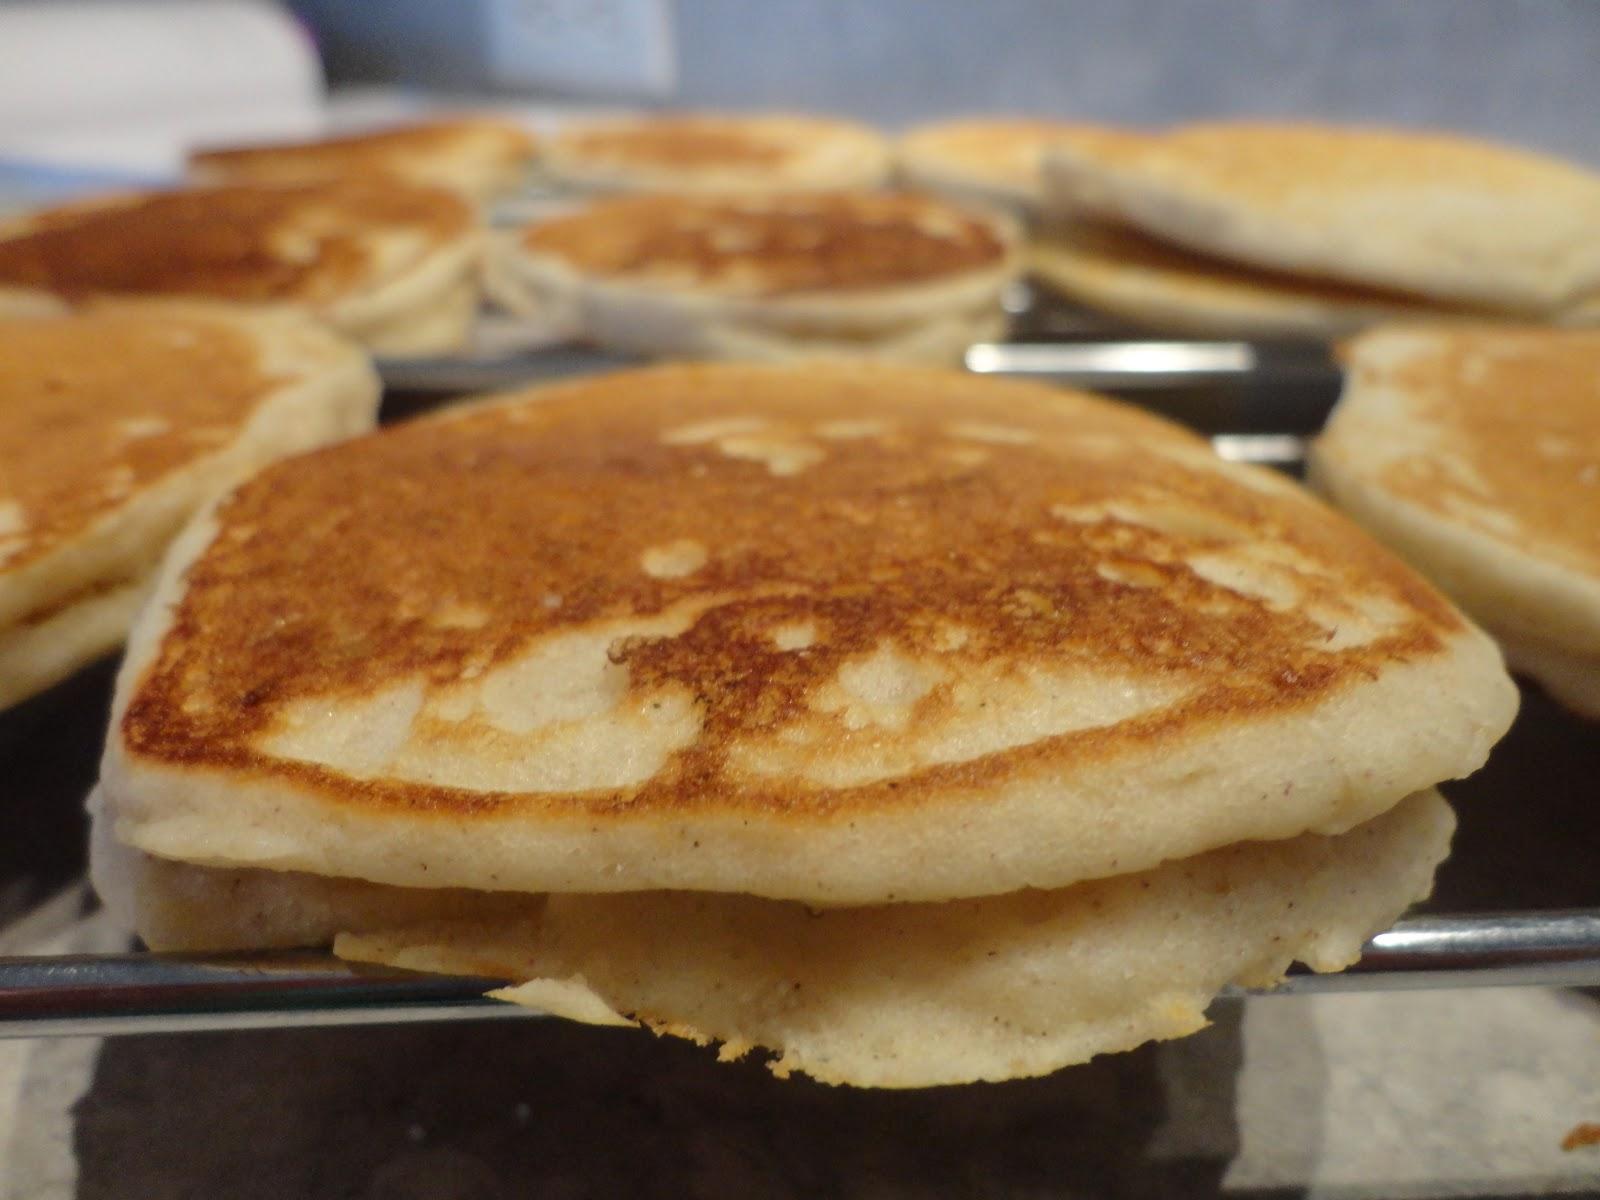 ... buttermilk pancakes gluten free silver dollar pancakes gluten free